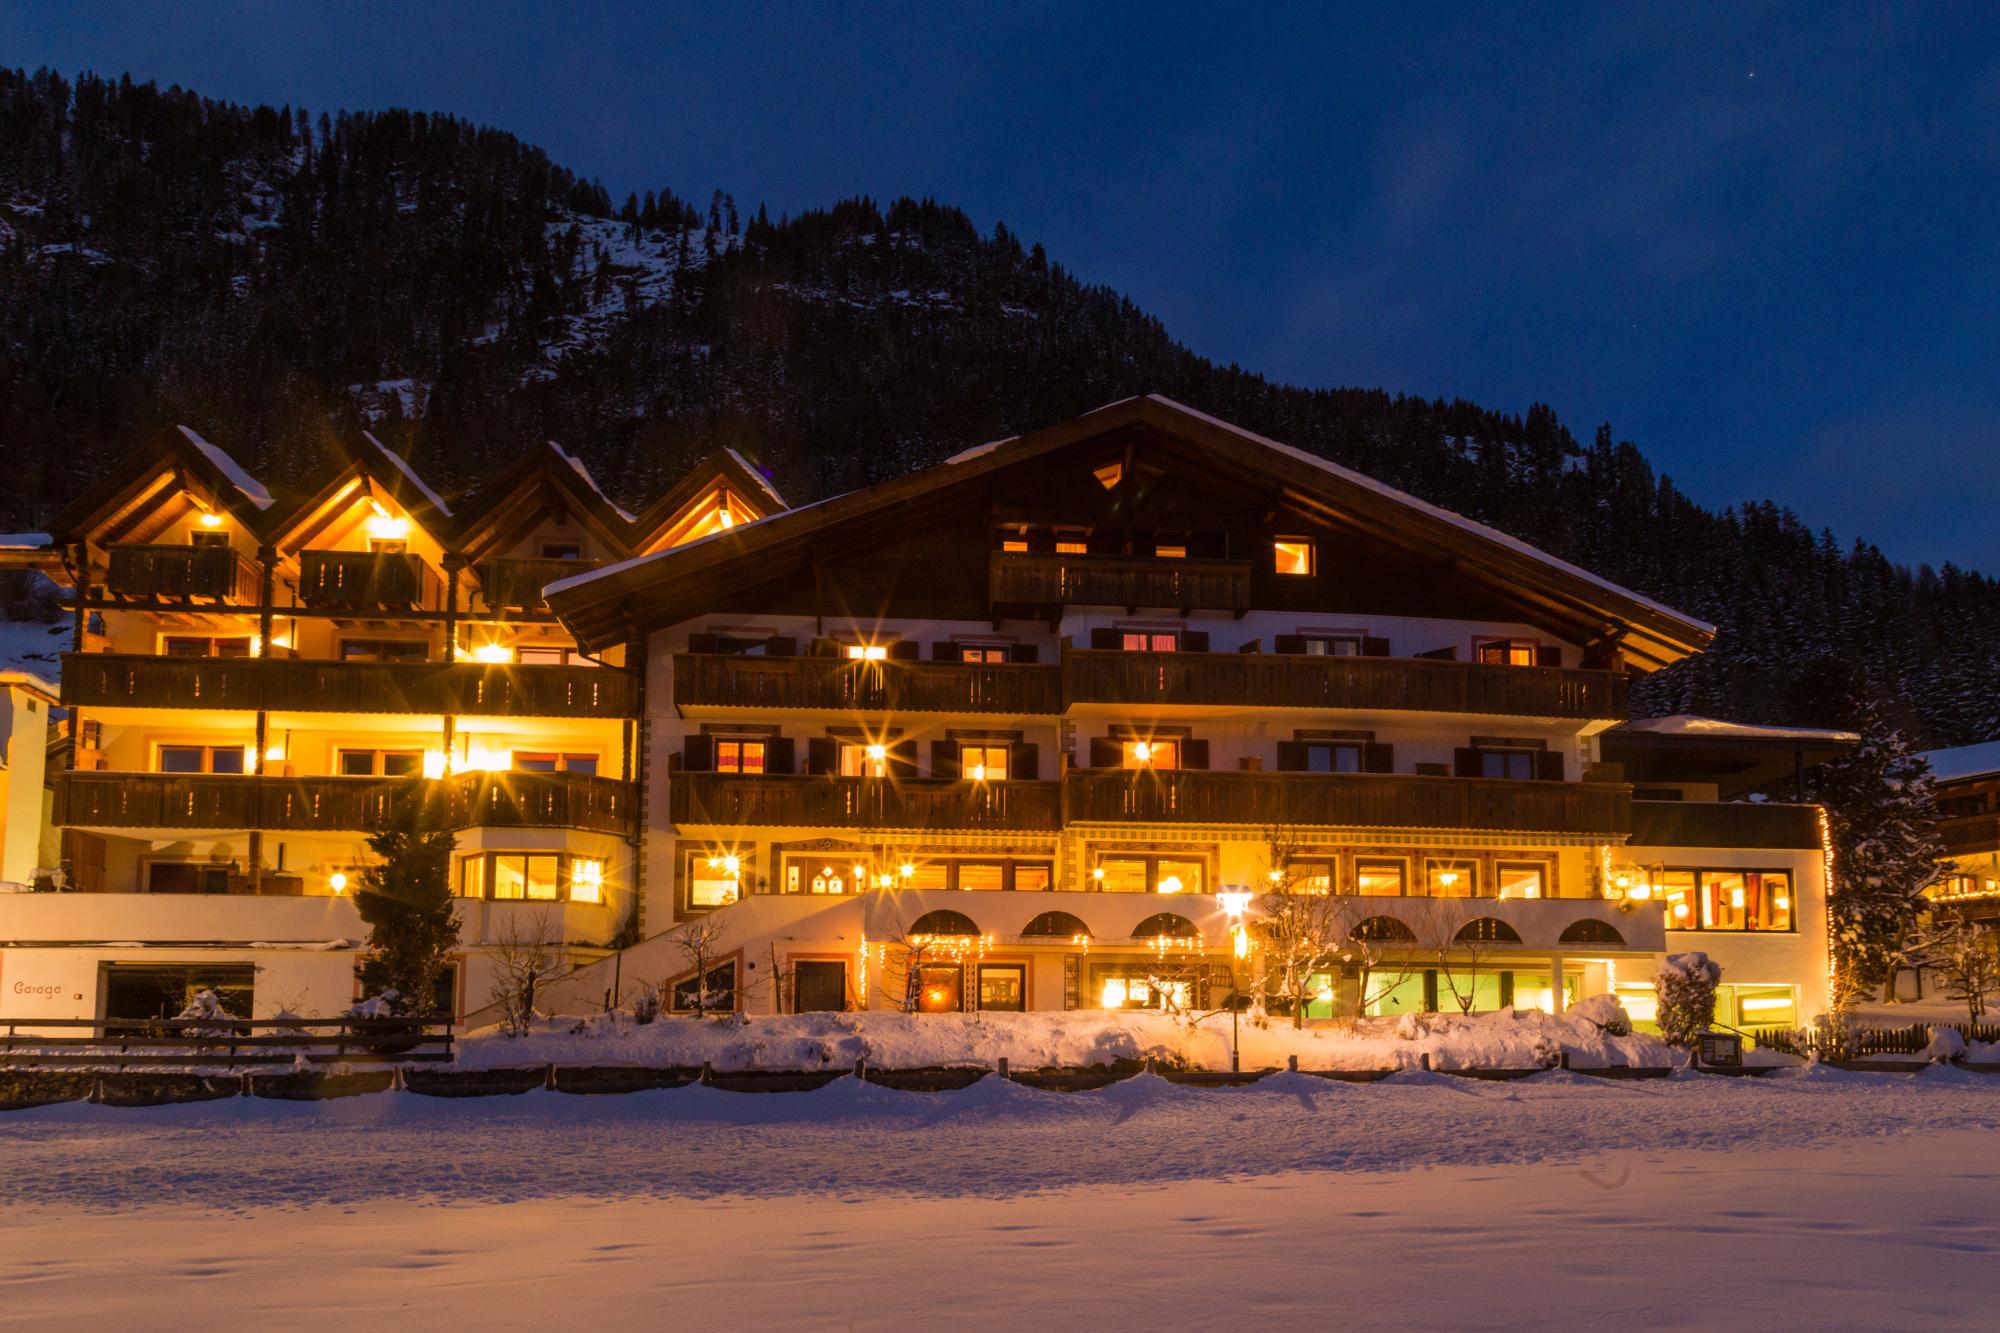 Urlaub Im Hotel Alpenland In Sudtirol